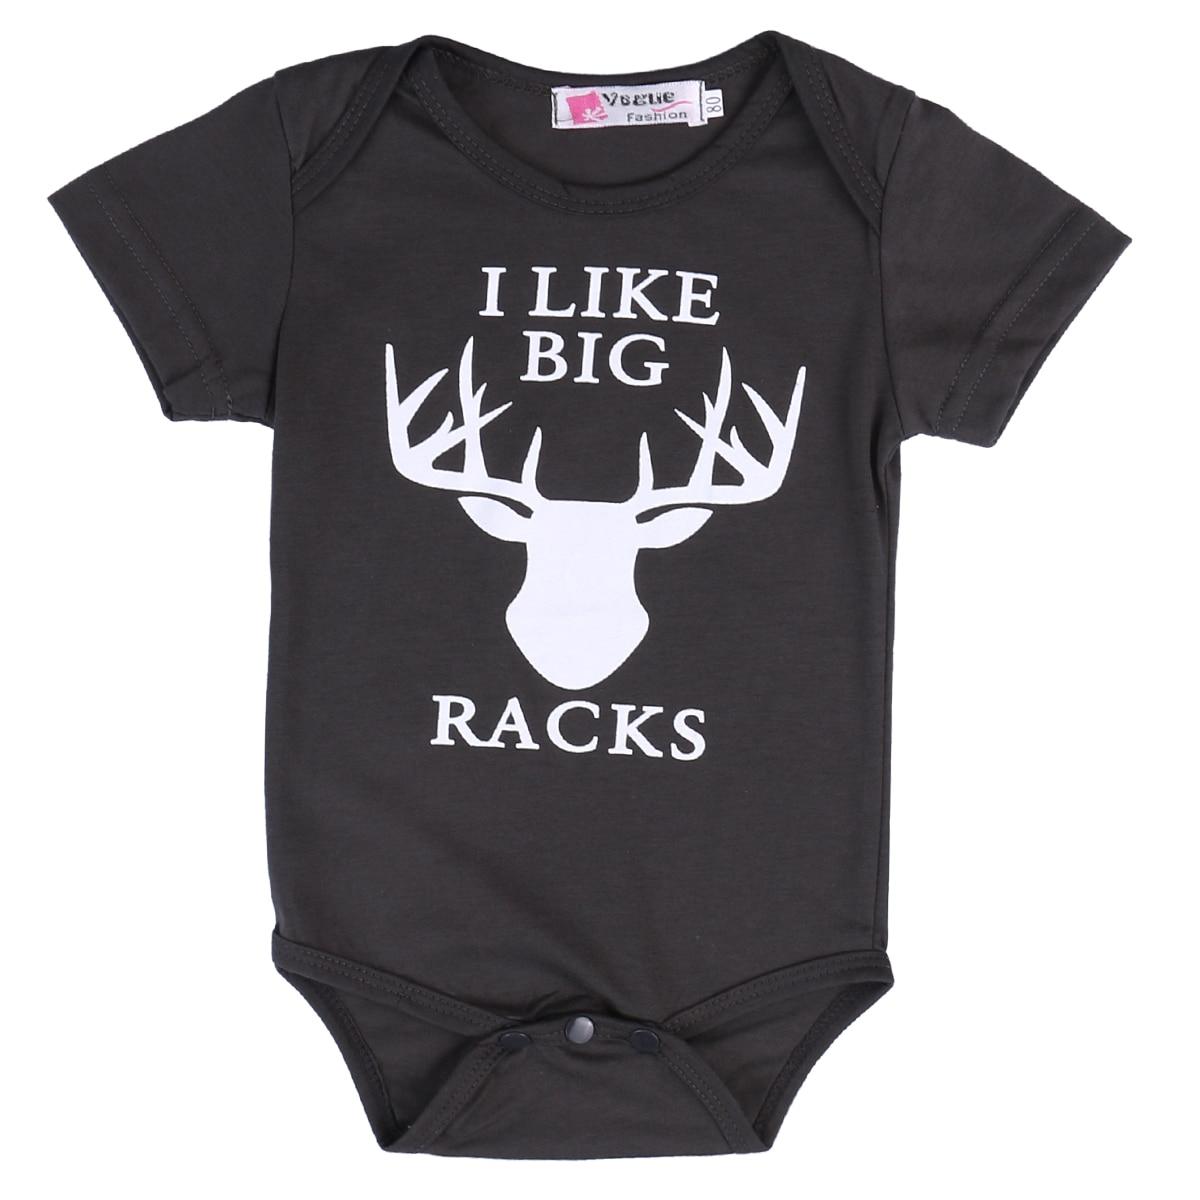 8cb248878b44 Newborn Baby Boys Girls Bowtie Short Sleeve Romper Playsuit Crotch ...